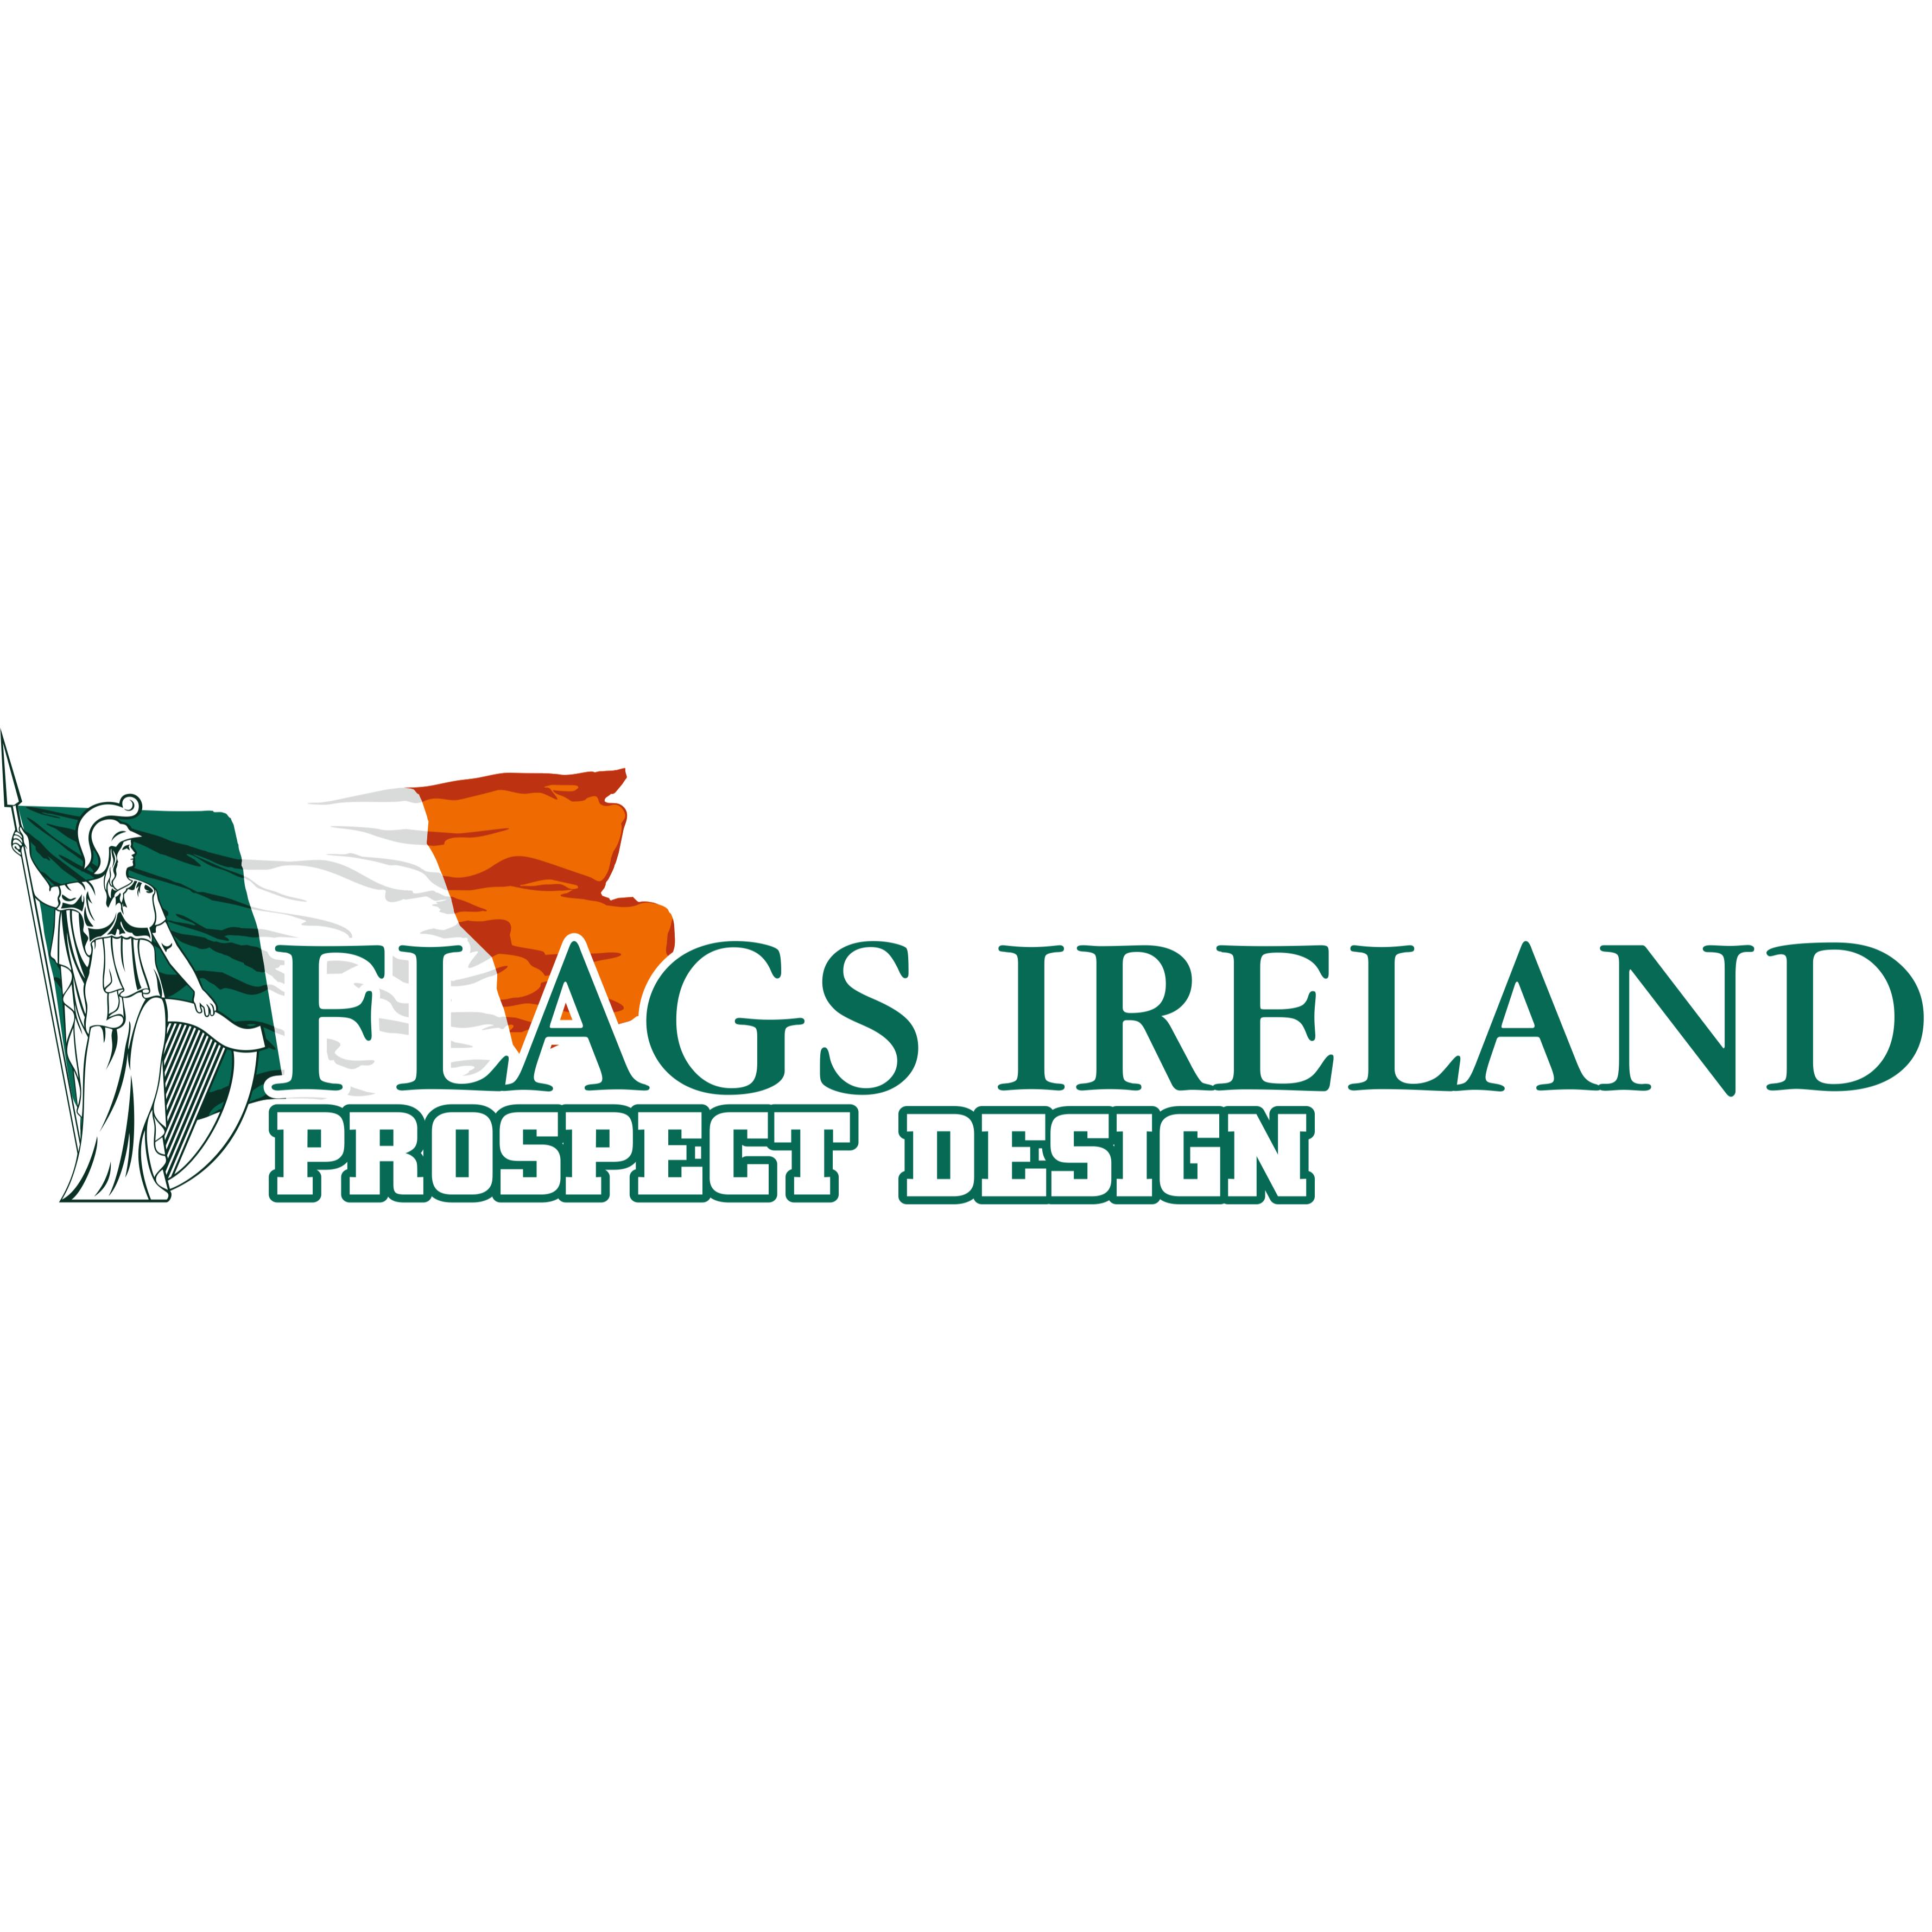 Flags Ireland